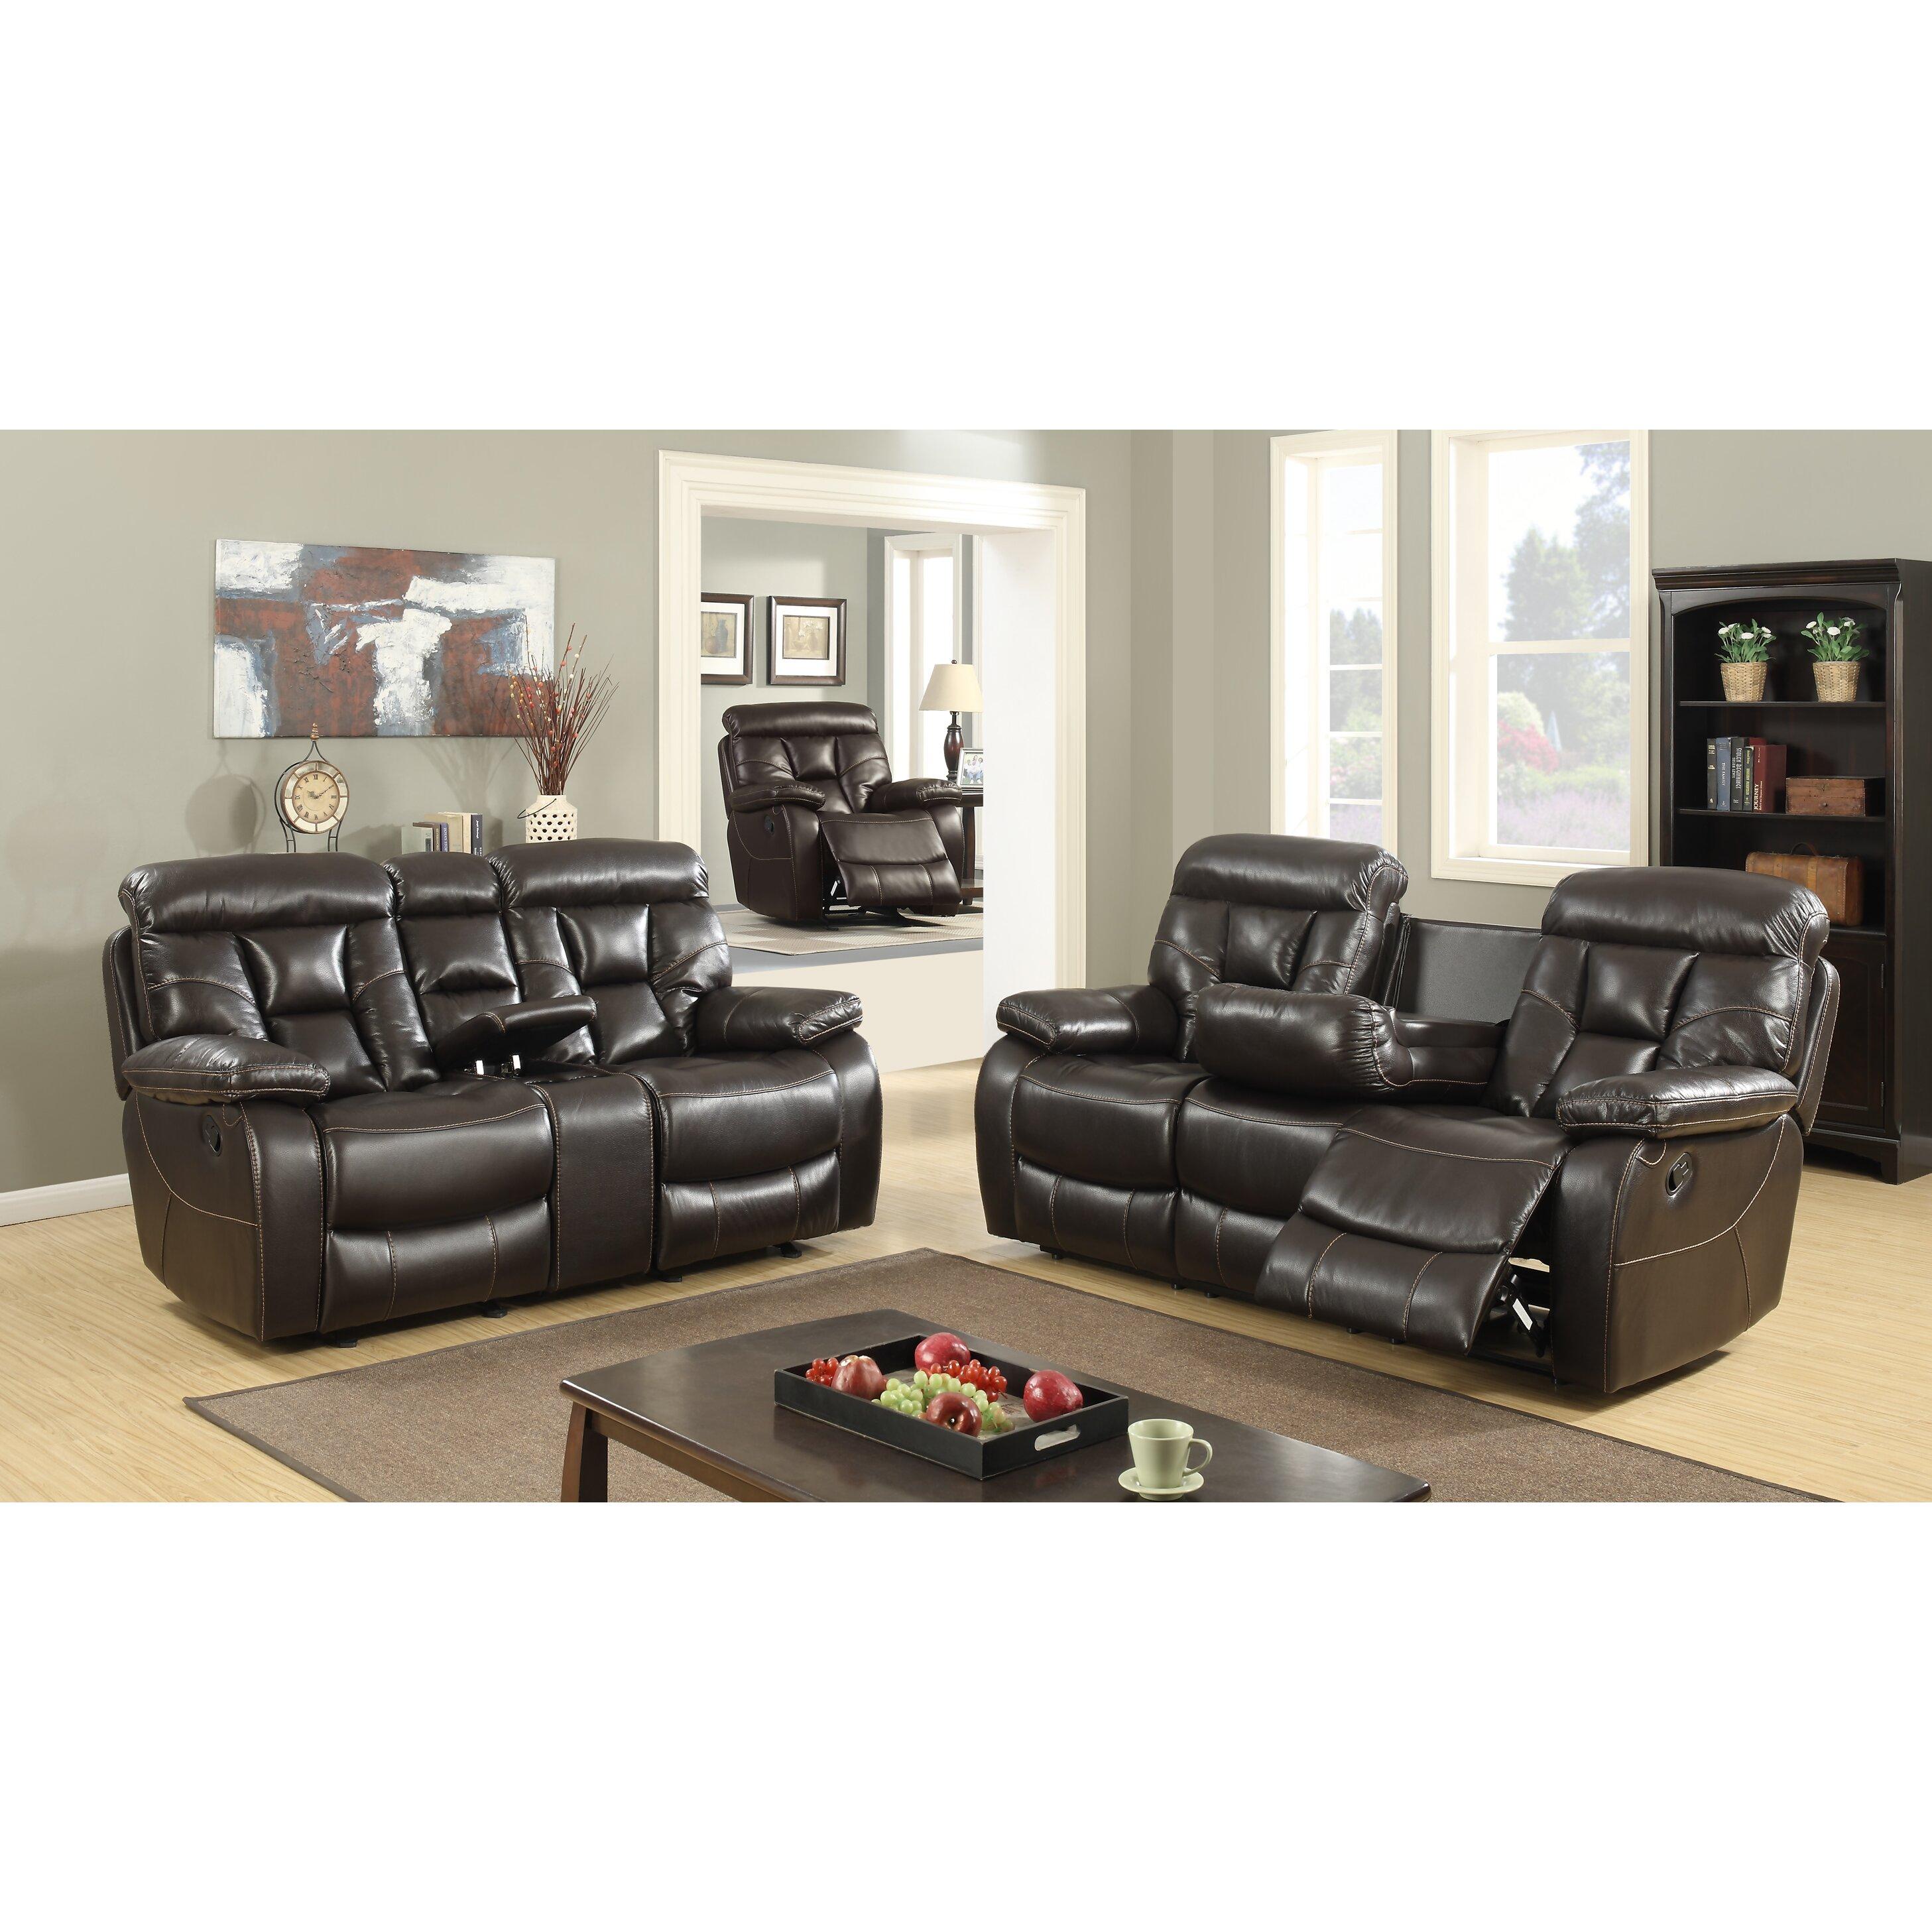 Quality Living Room Furniture Best Quality Furniture 3 Piece Living Room Set Wayfair